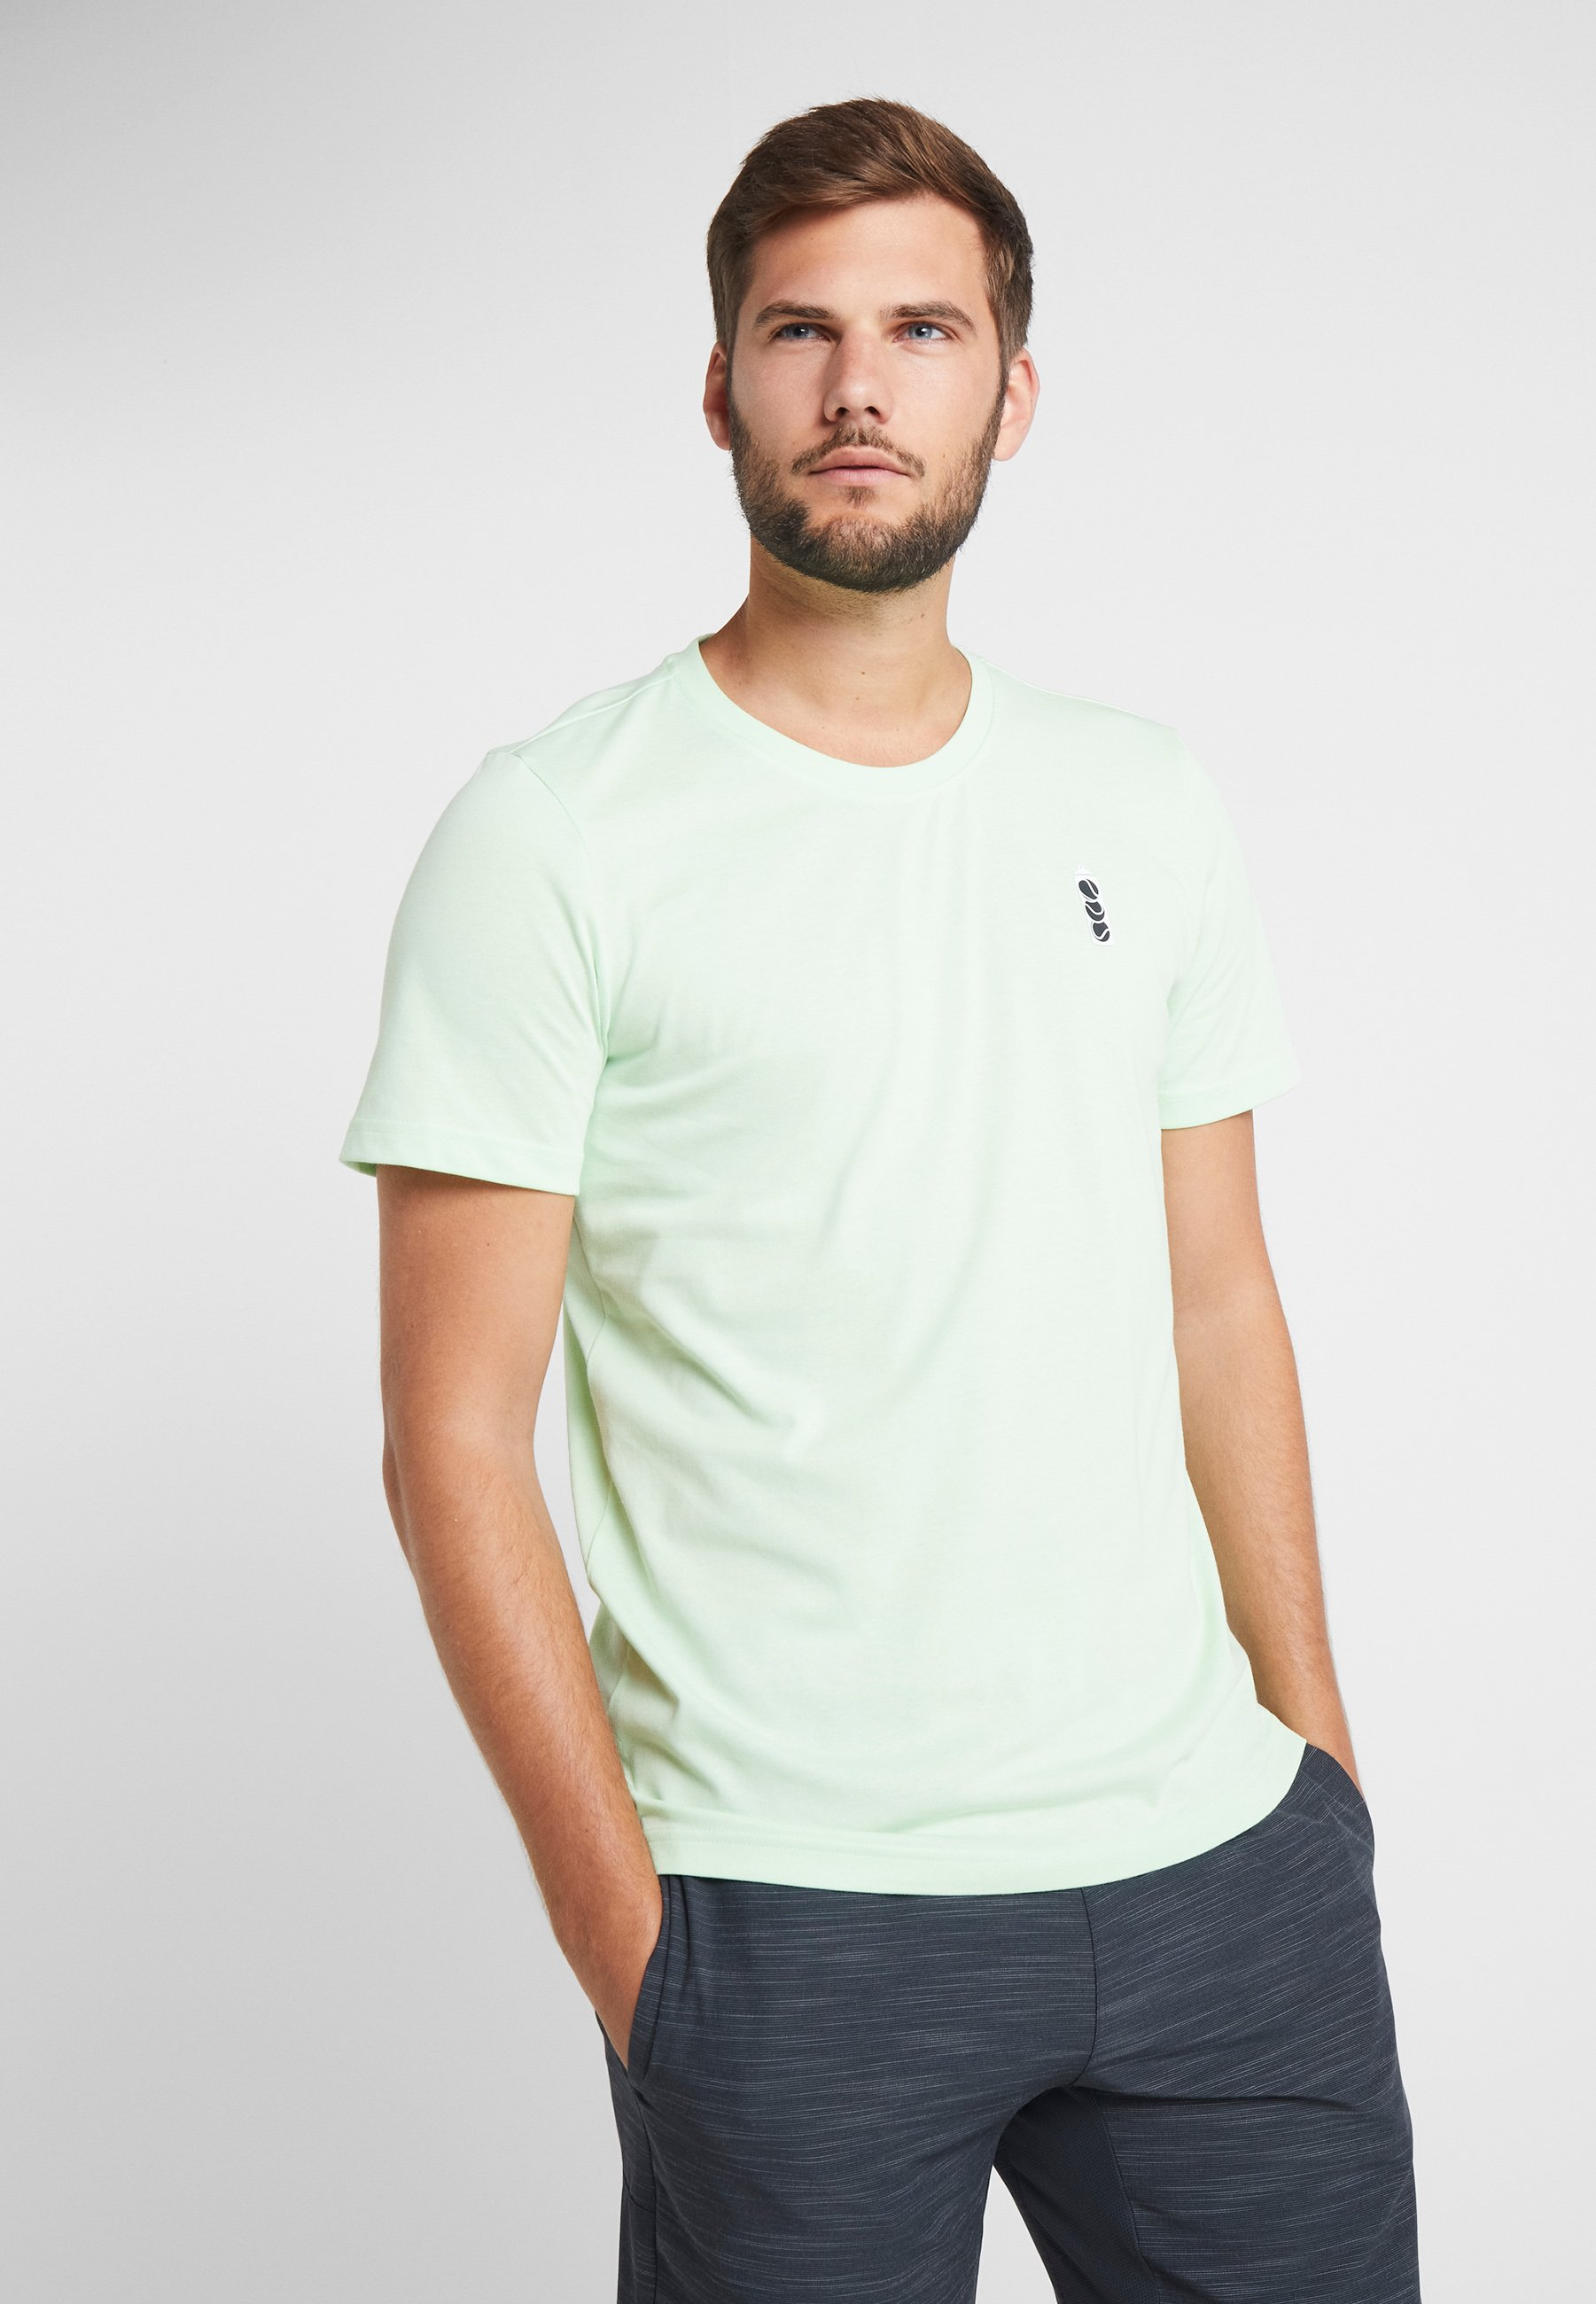 Performance TeeT Imprimé Green Graphic Adidas shirt zVqMpSU